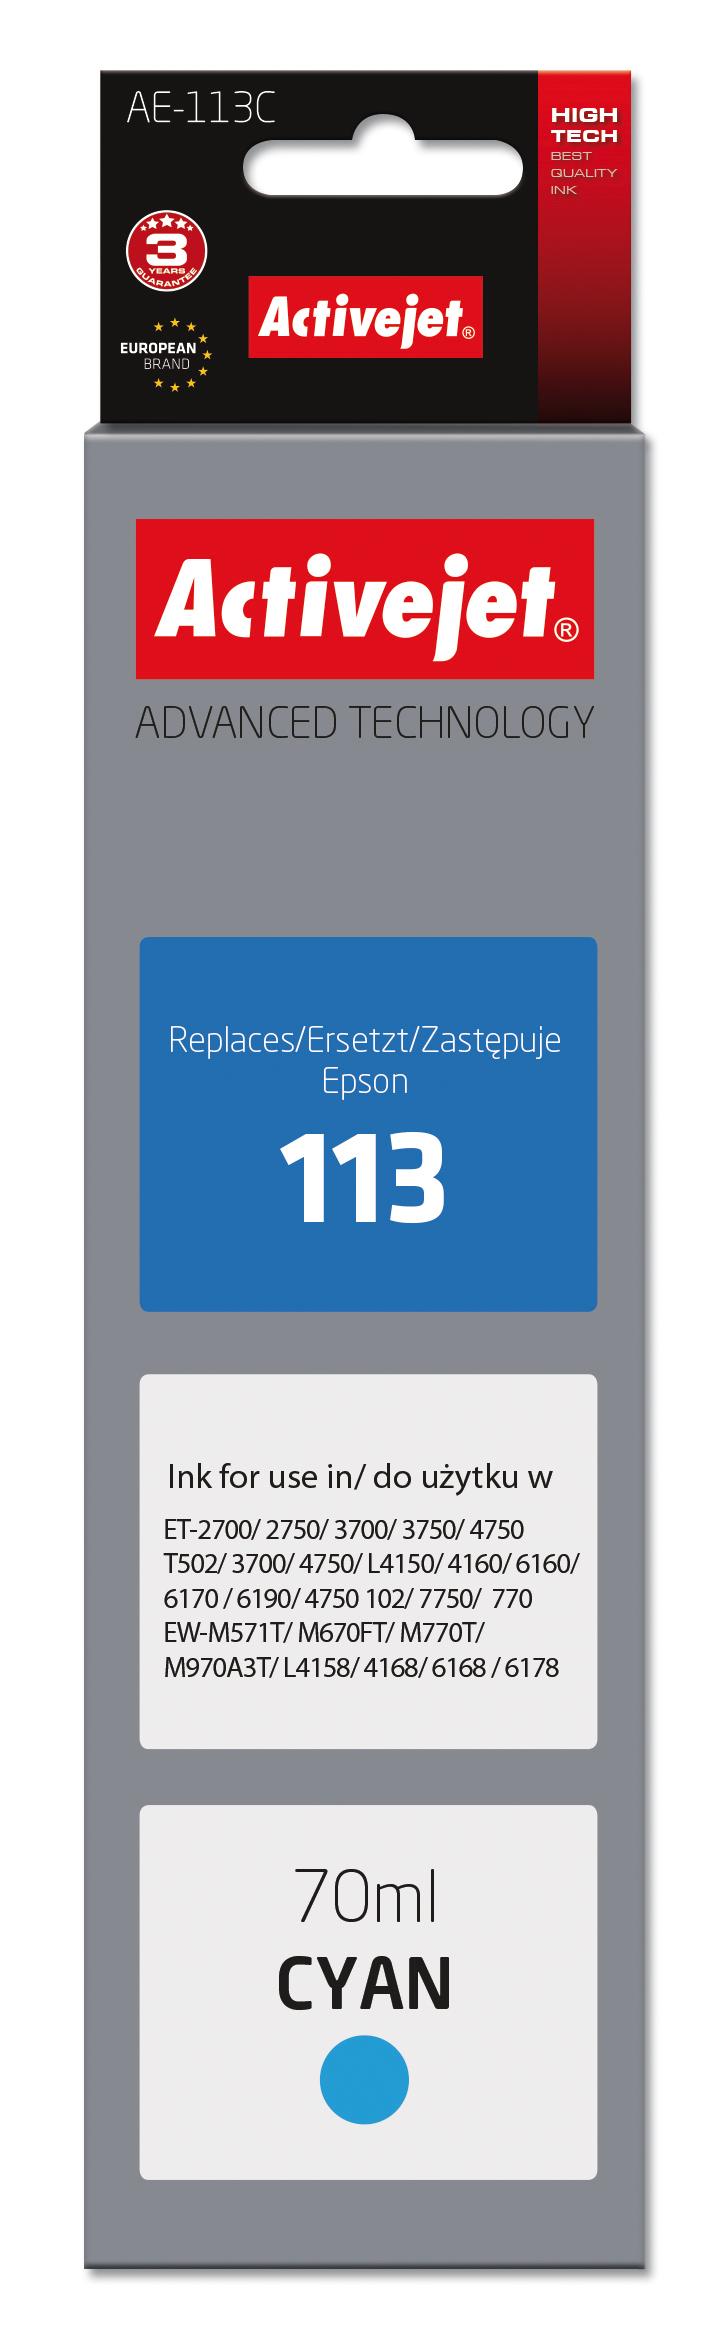 Tusz Activejet AE-113C do drukarki Epson, Zamiennik Epson 113 C13T06B240;  Supreme; 70 ml; błekitny.